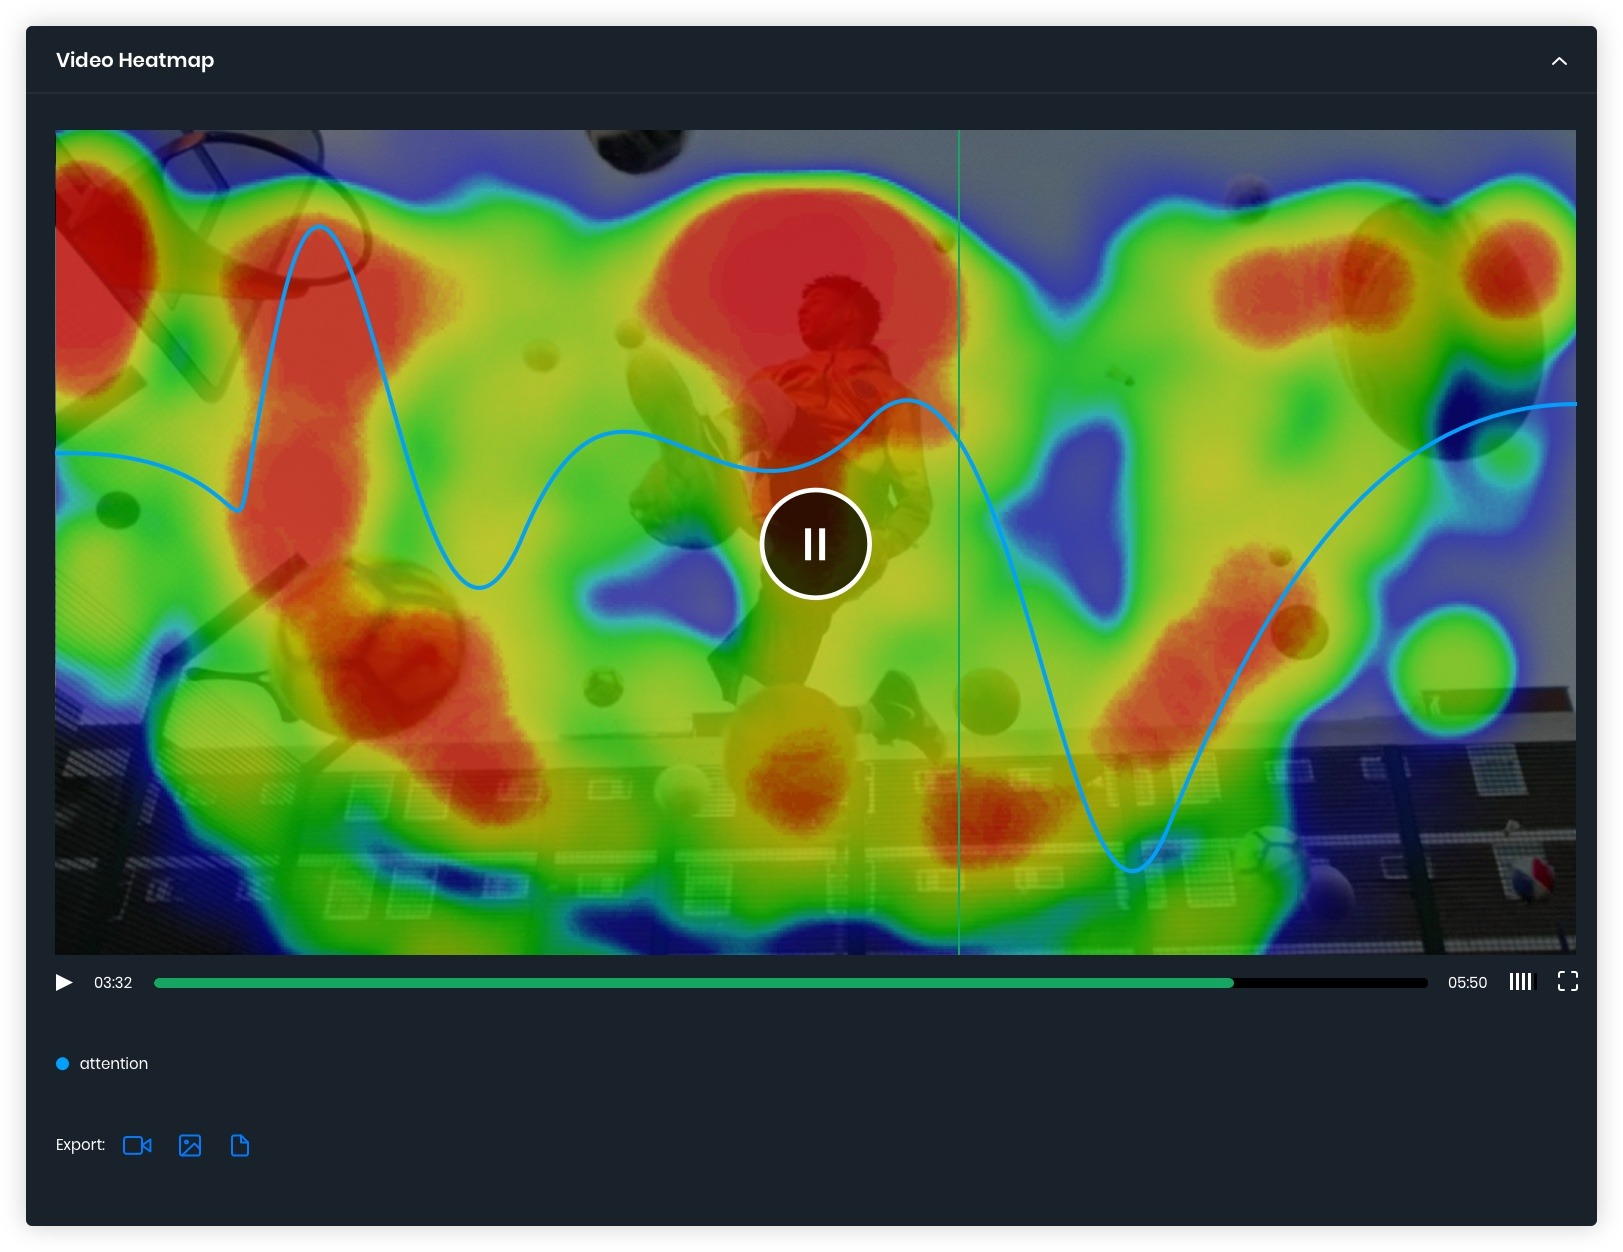 HX Workbench - eye-gaze heatmap overlay report